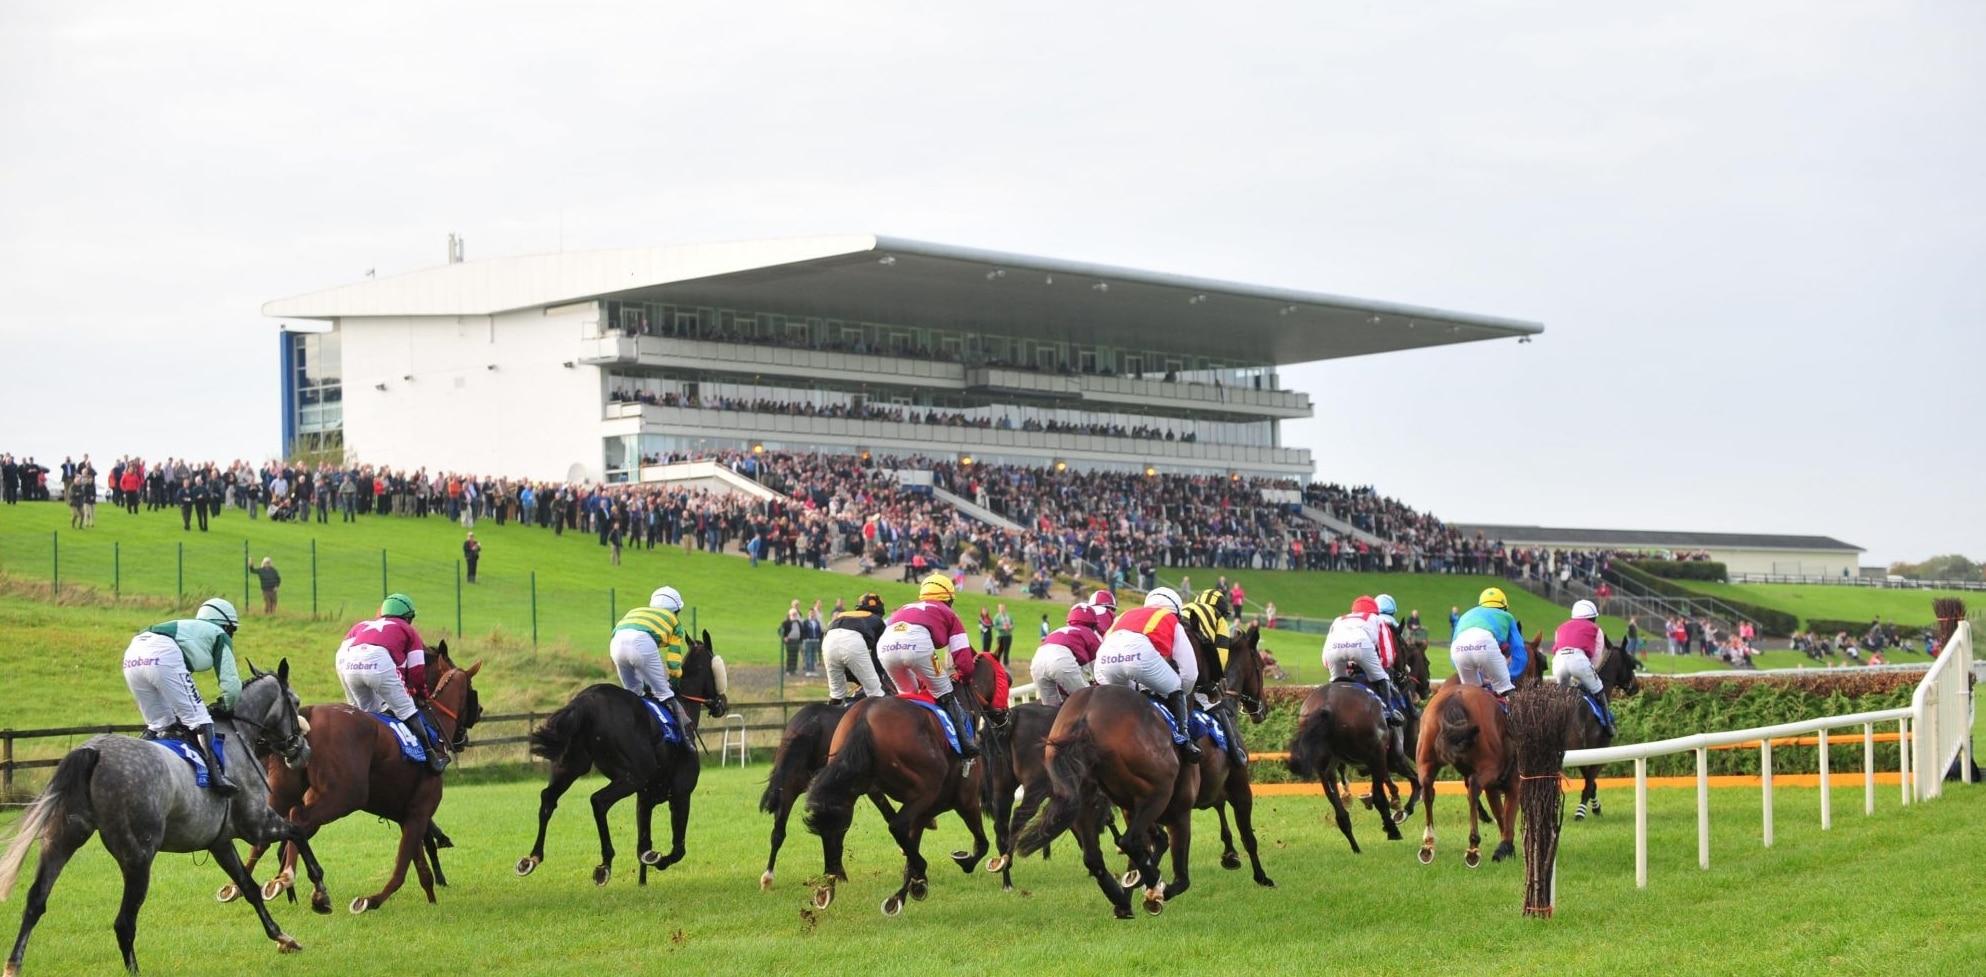 Limerick Student Races 2017